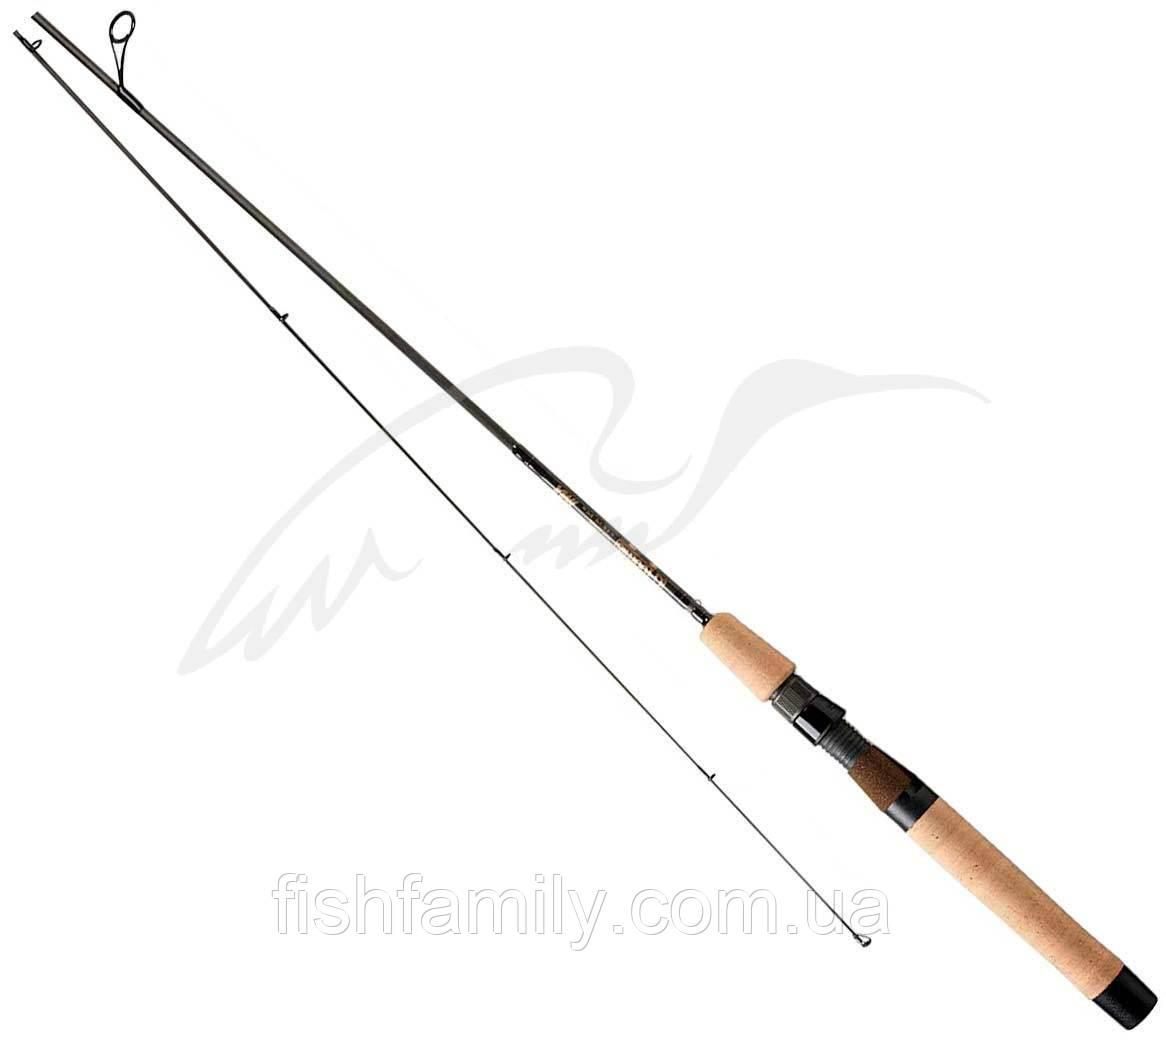 Спиннинг G.Loomis Classic Trout Panfish Spinning SR842-2 IMX 2.13m 1.75-8.75g